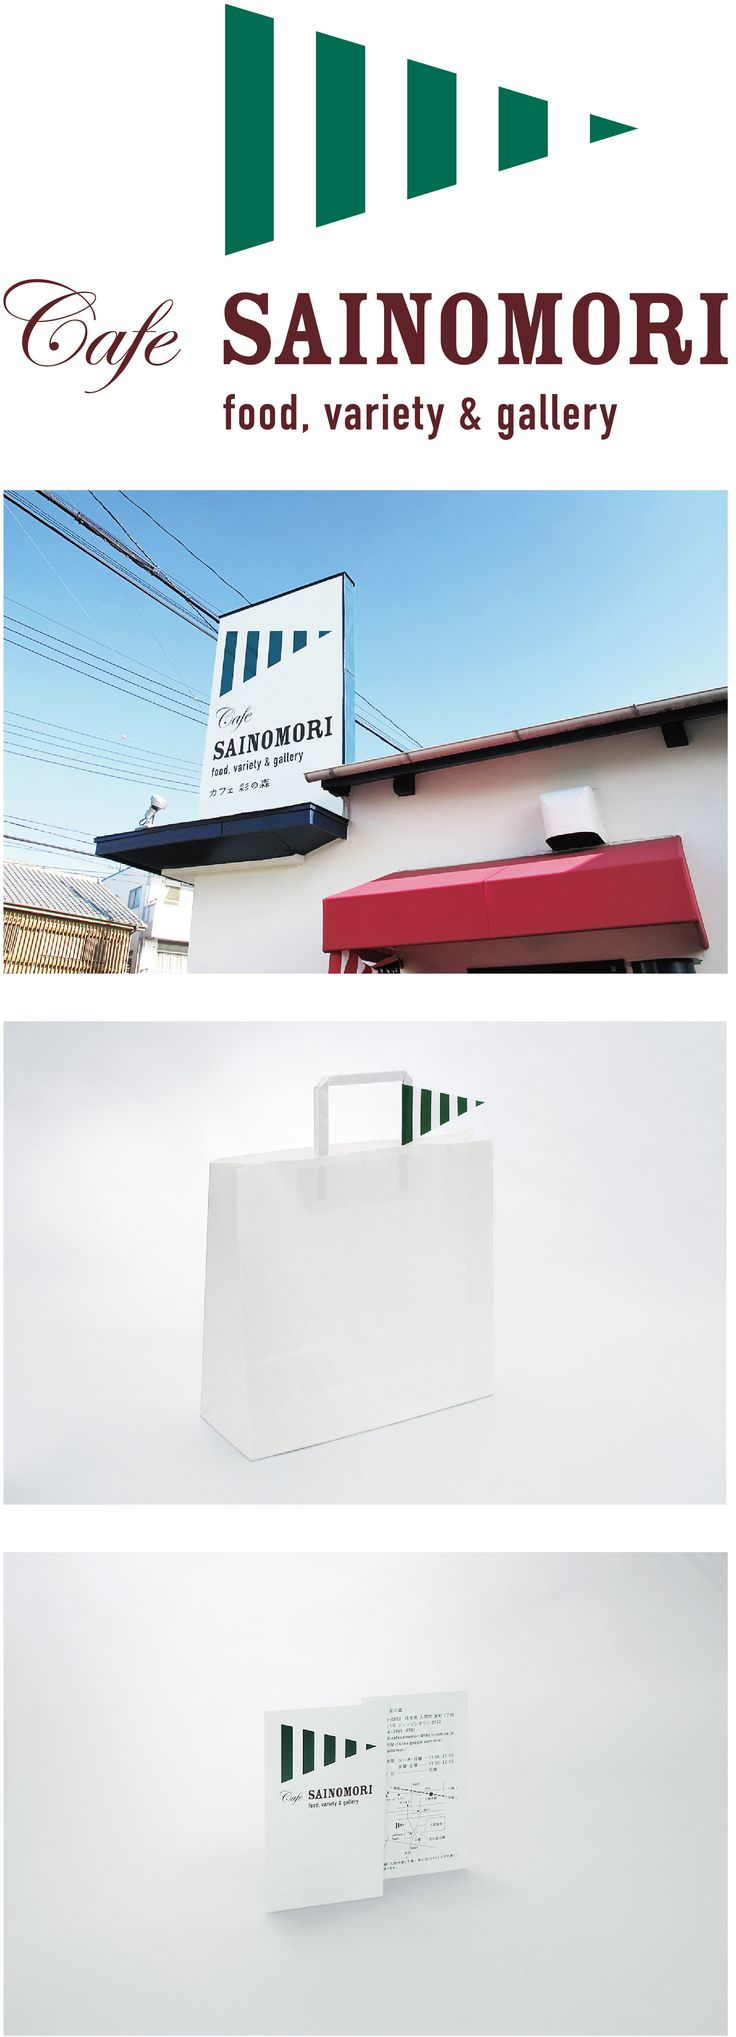 http://dododesign.jp/index.html もっと見る